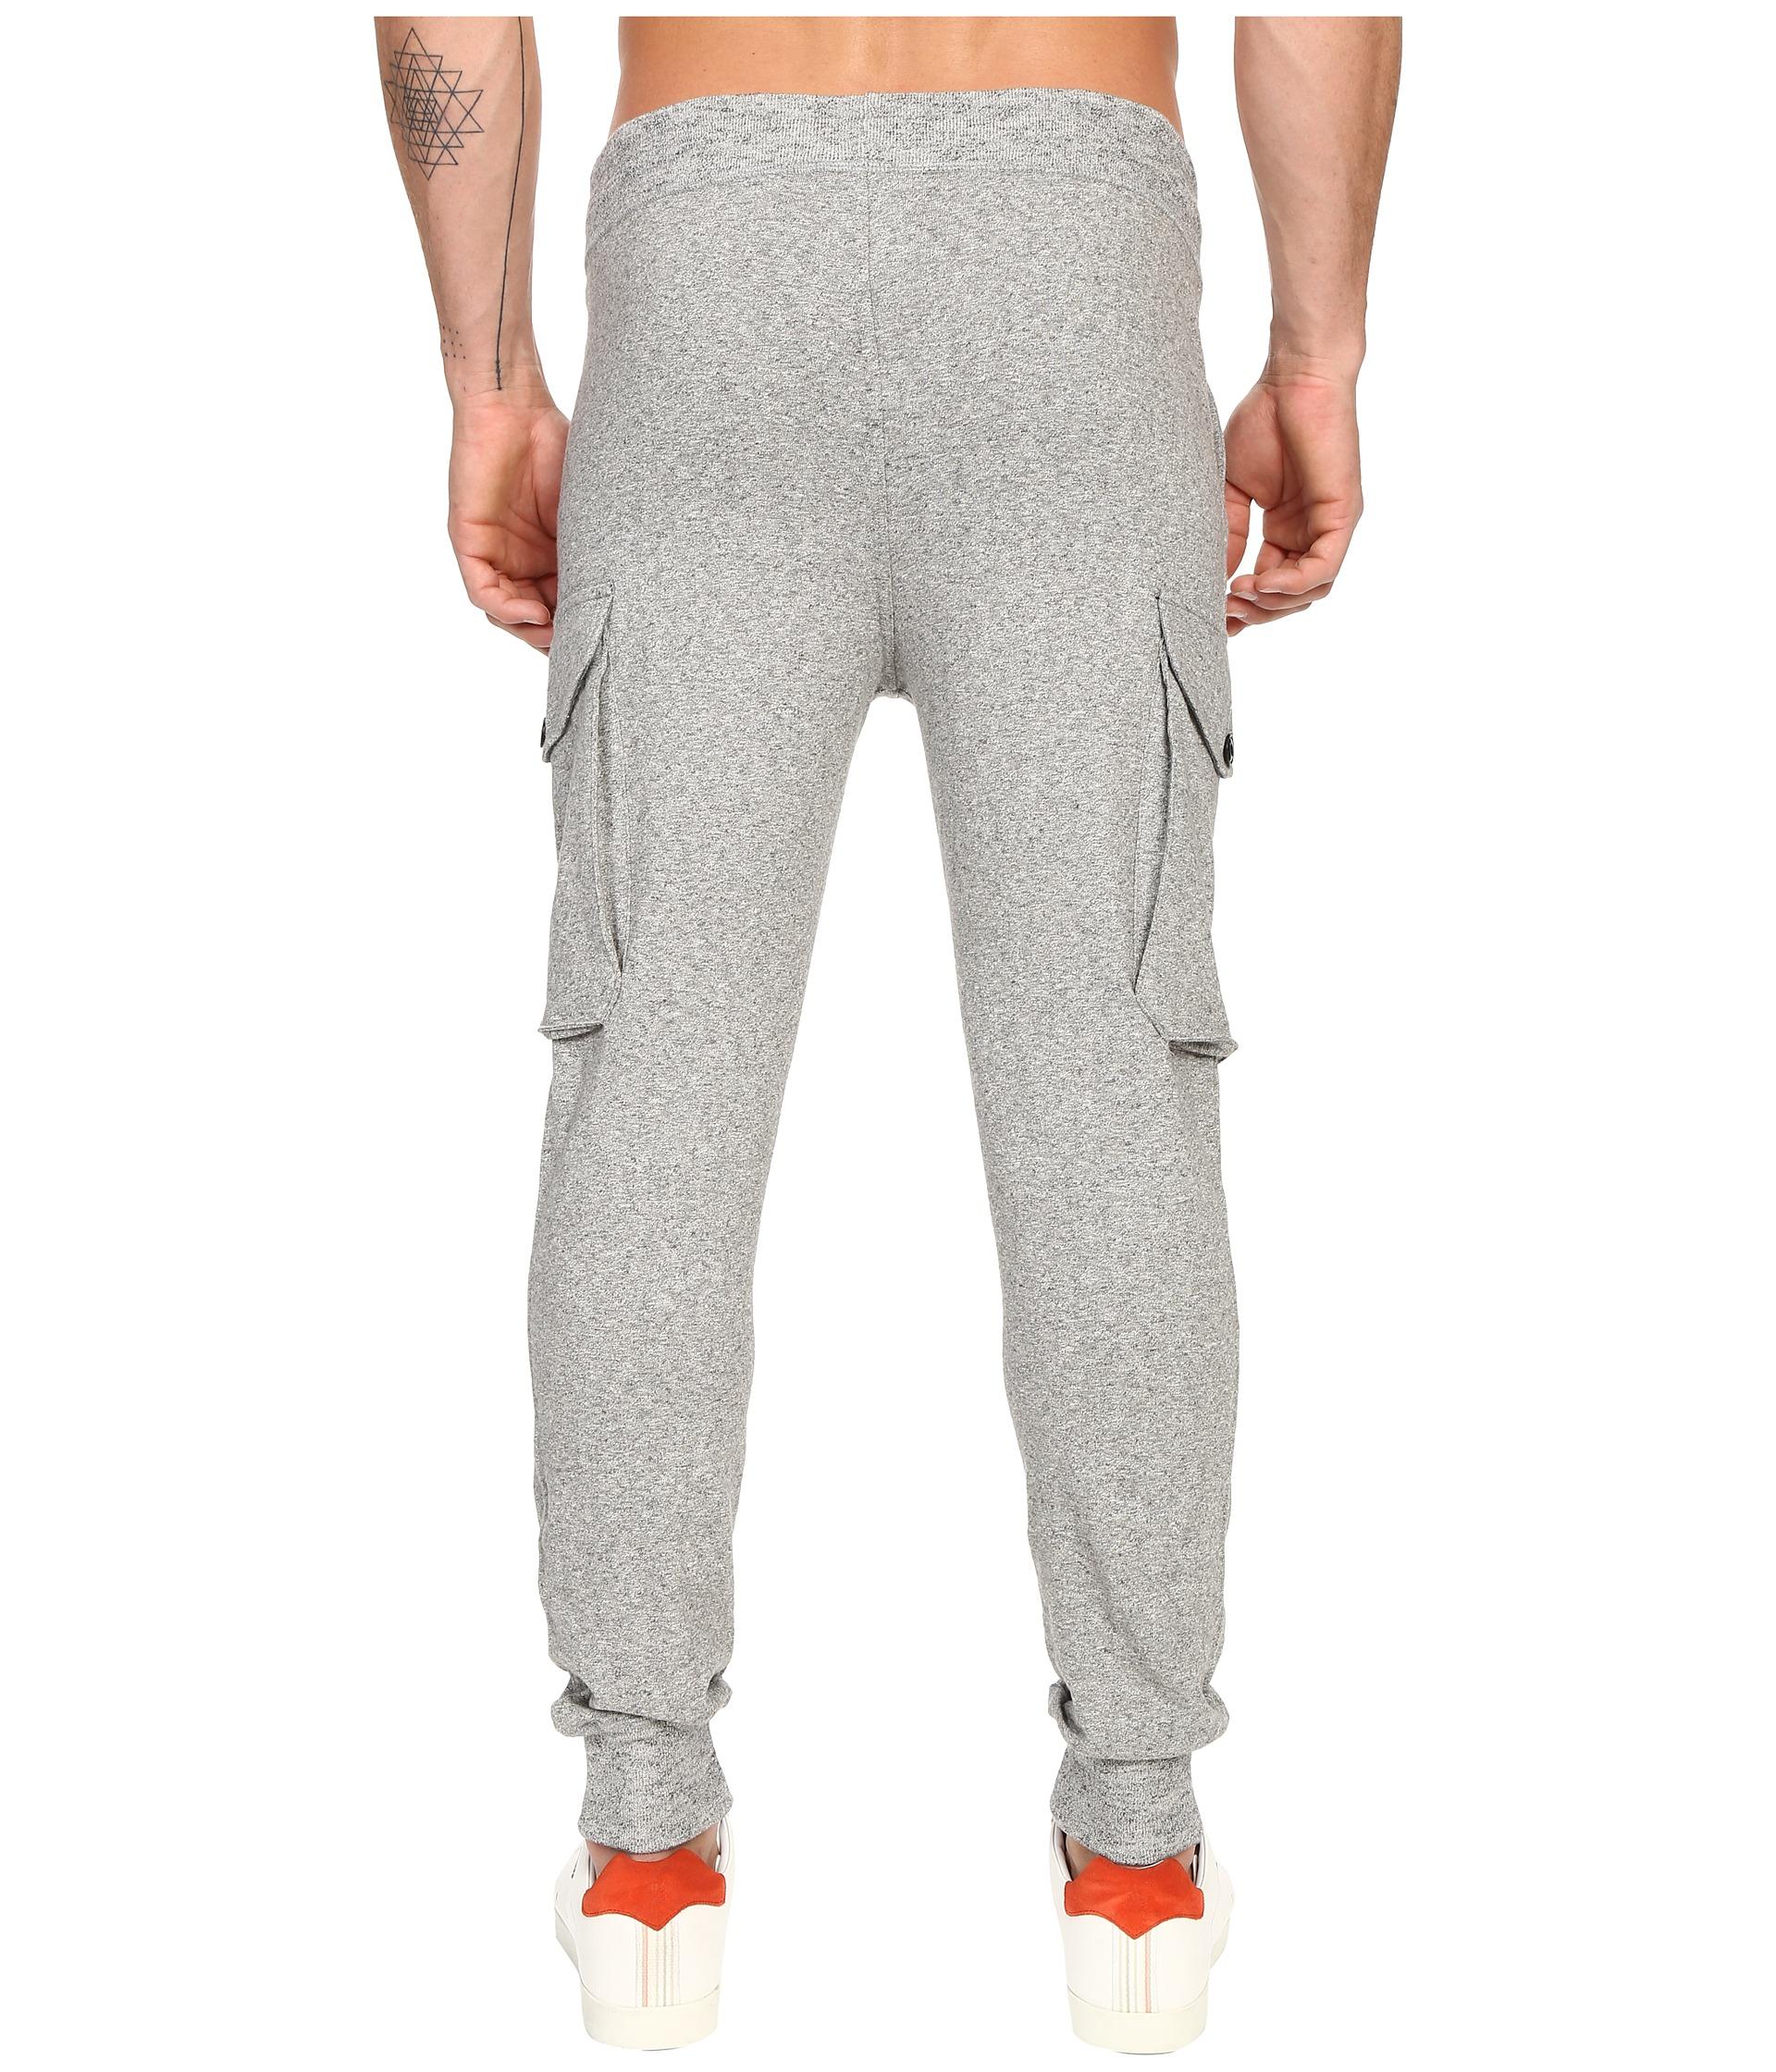 Todd Snyder + Champion Slim Cargo Sweatpants Grey Heather